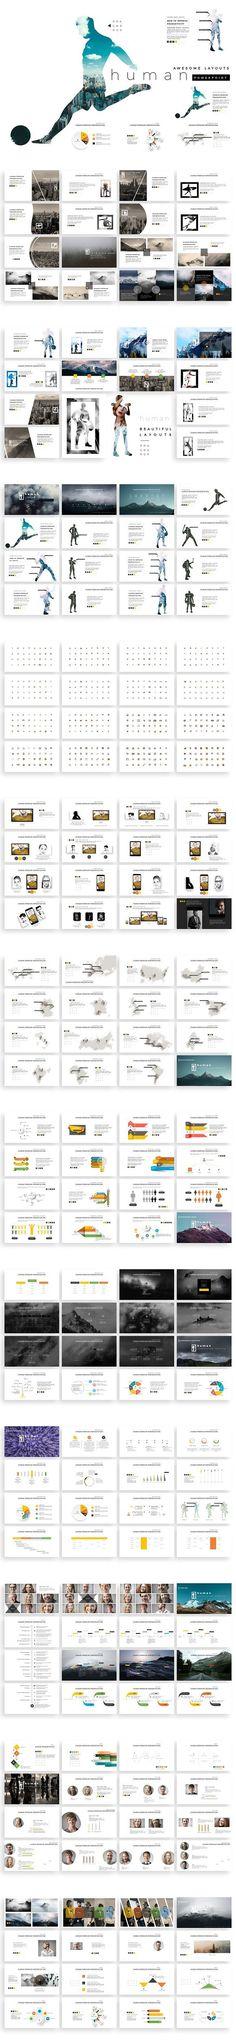 PowerPoint timeline templates for timeline presentation Pinterest - timeline spreadsheet template